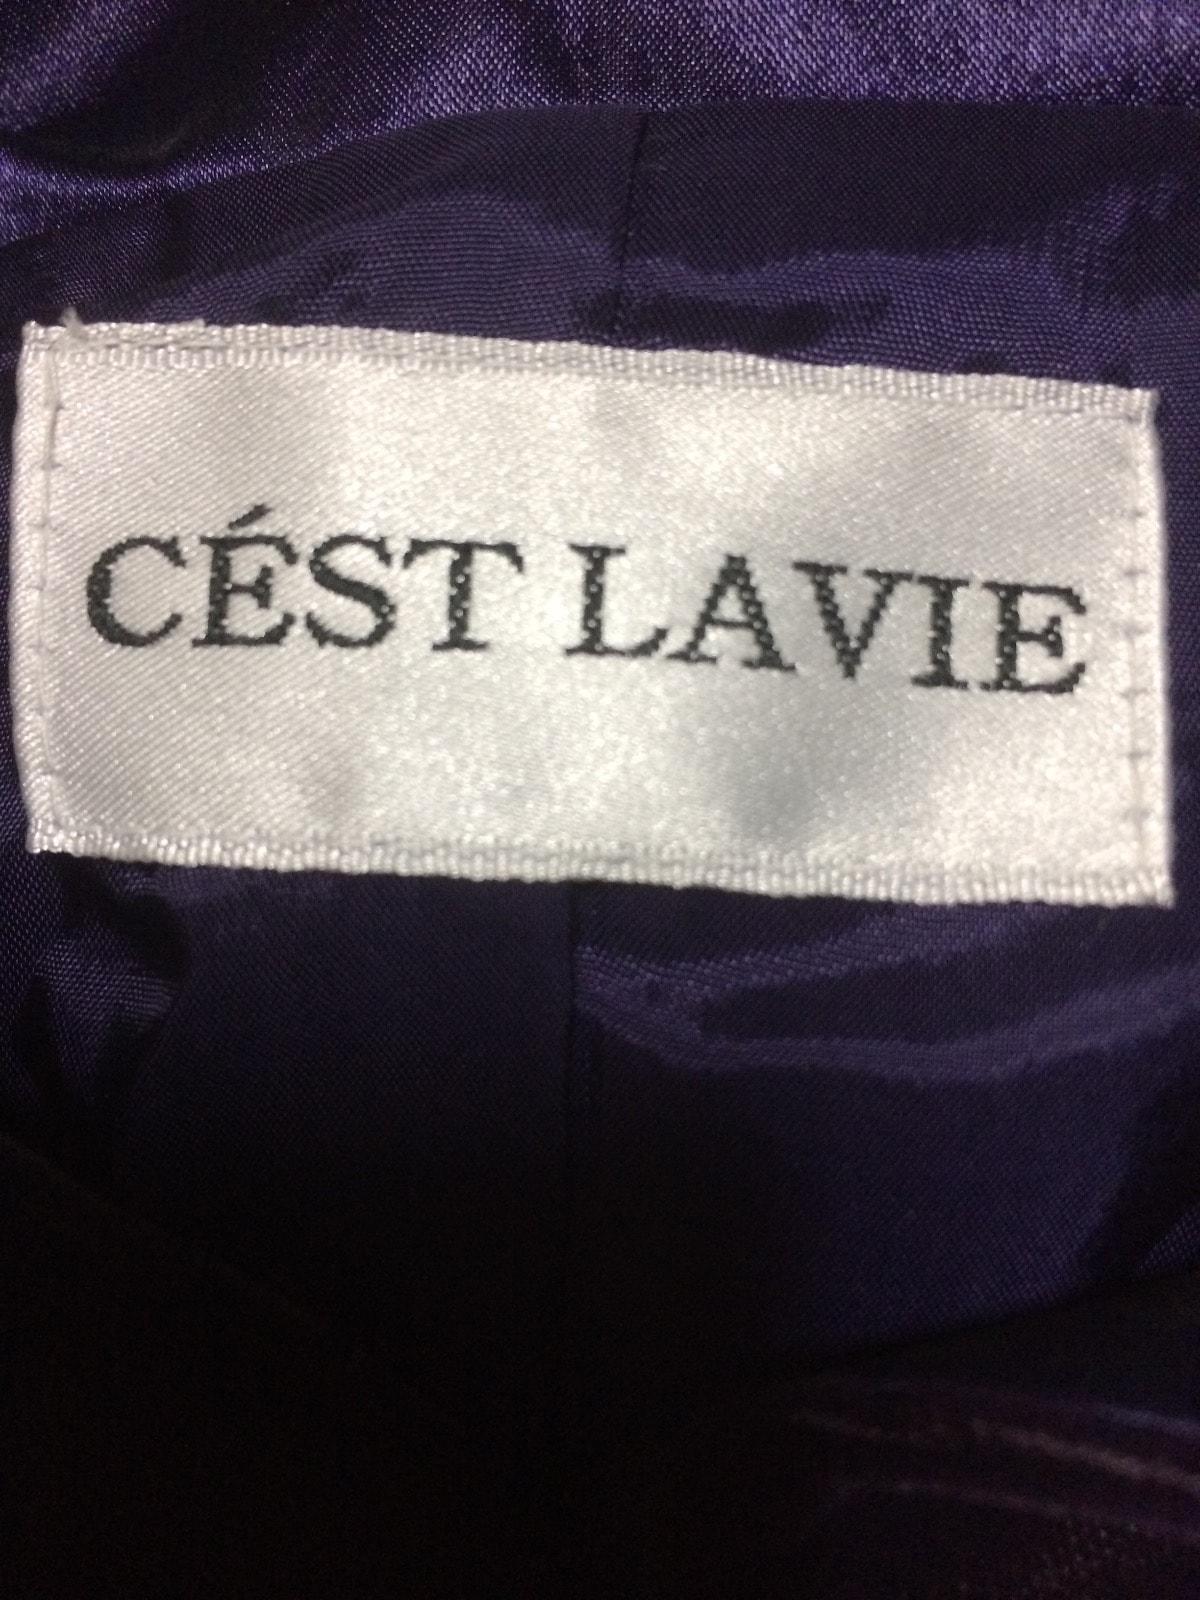 CEST LAVIE(セラヴィ)のワンピース